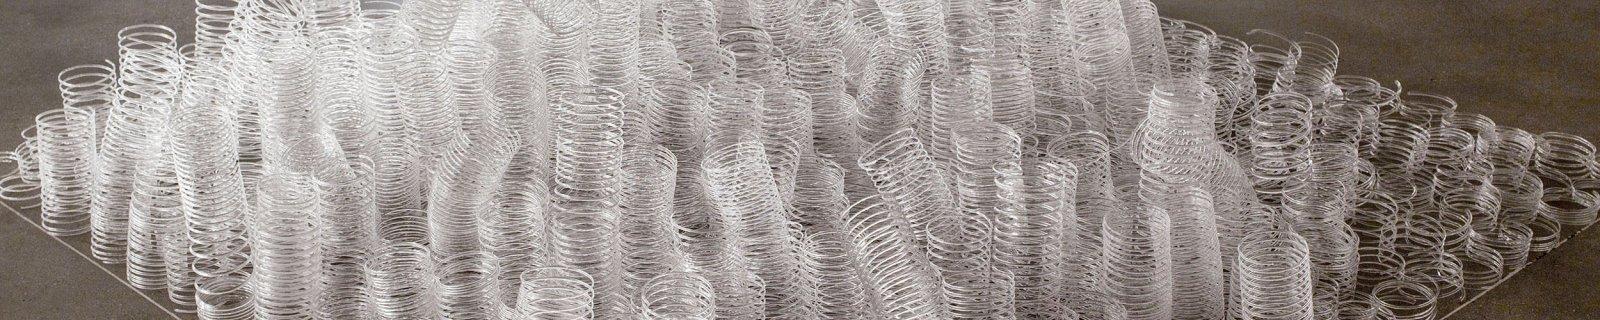 Some Chaos by Stine Bidstrup, New Glass Review 37